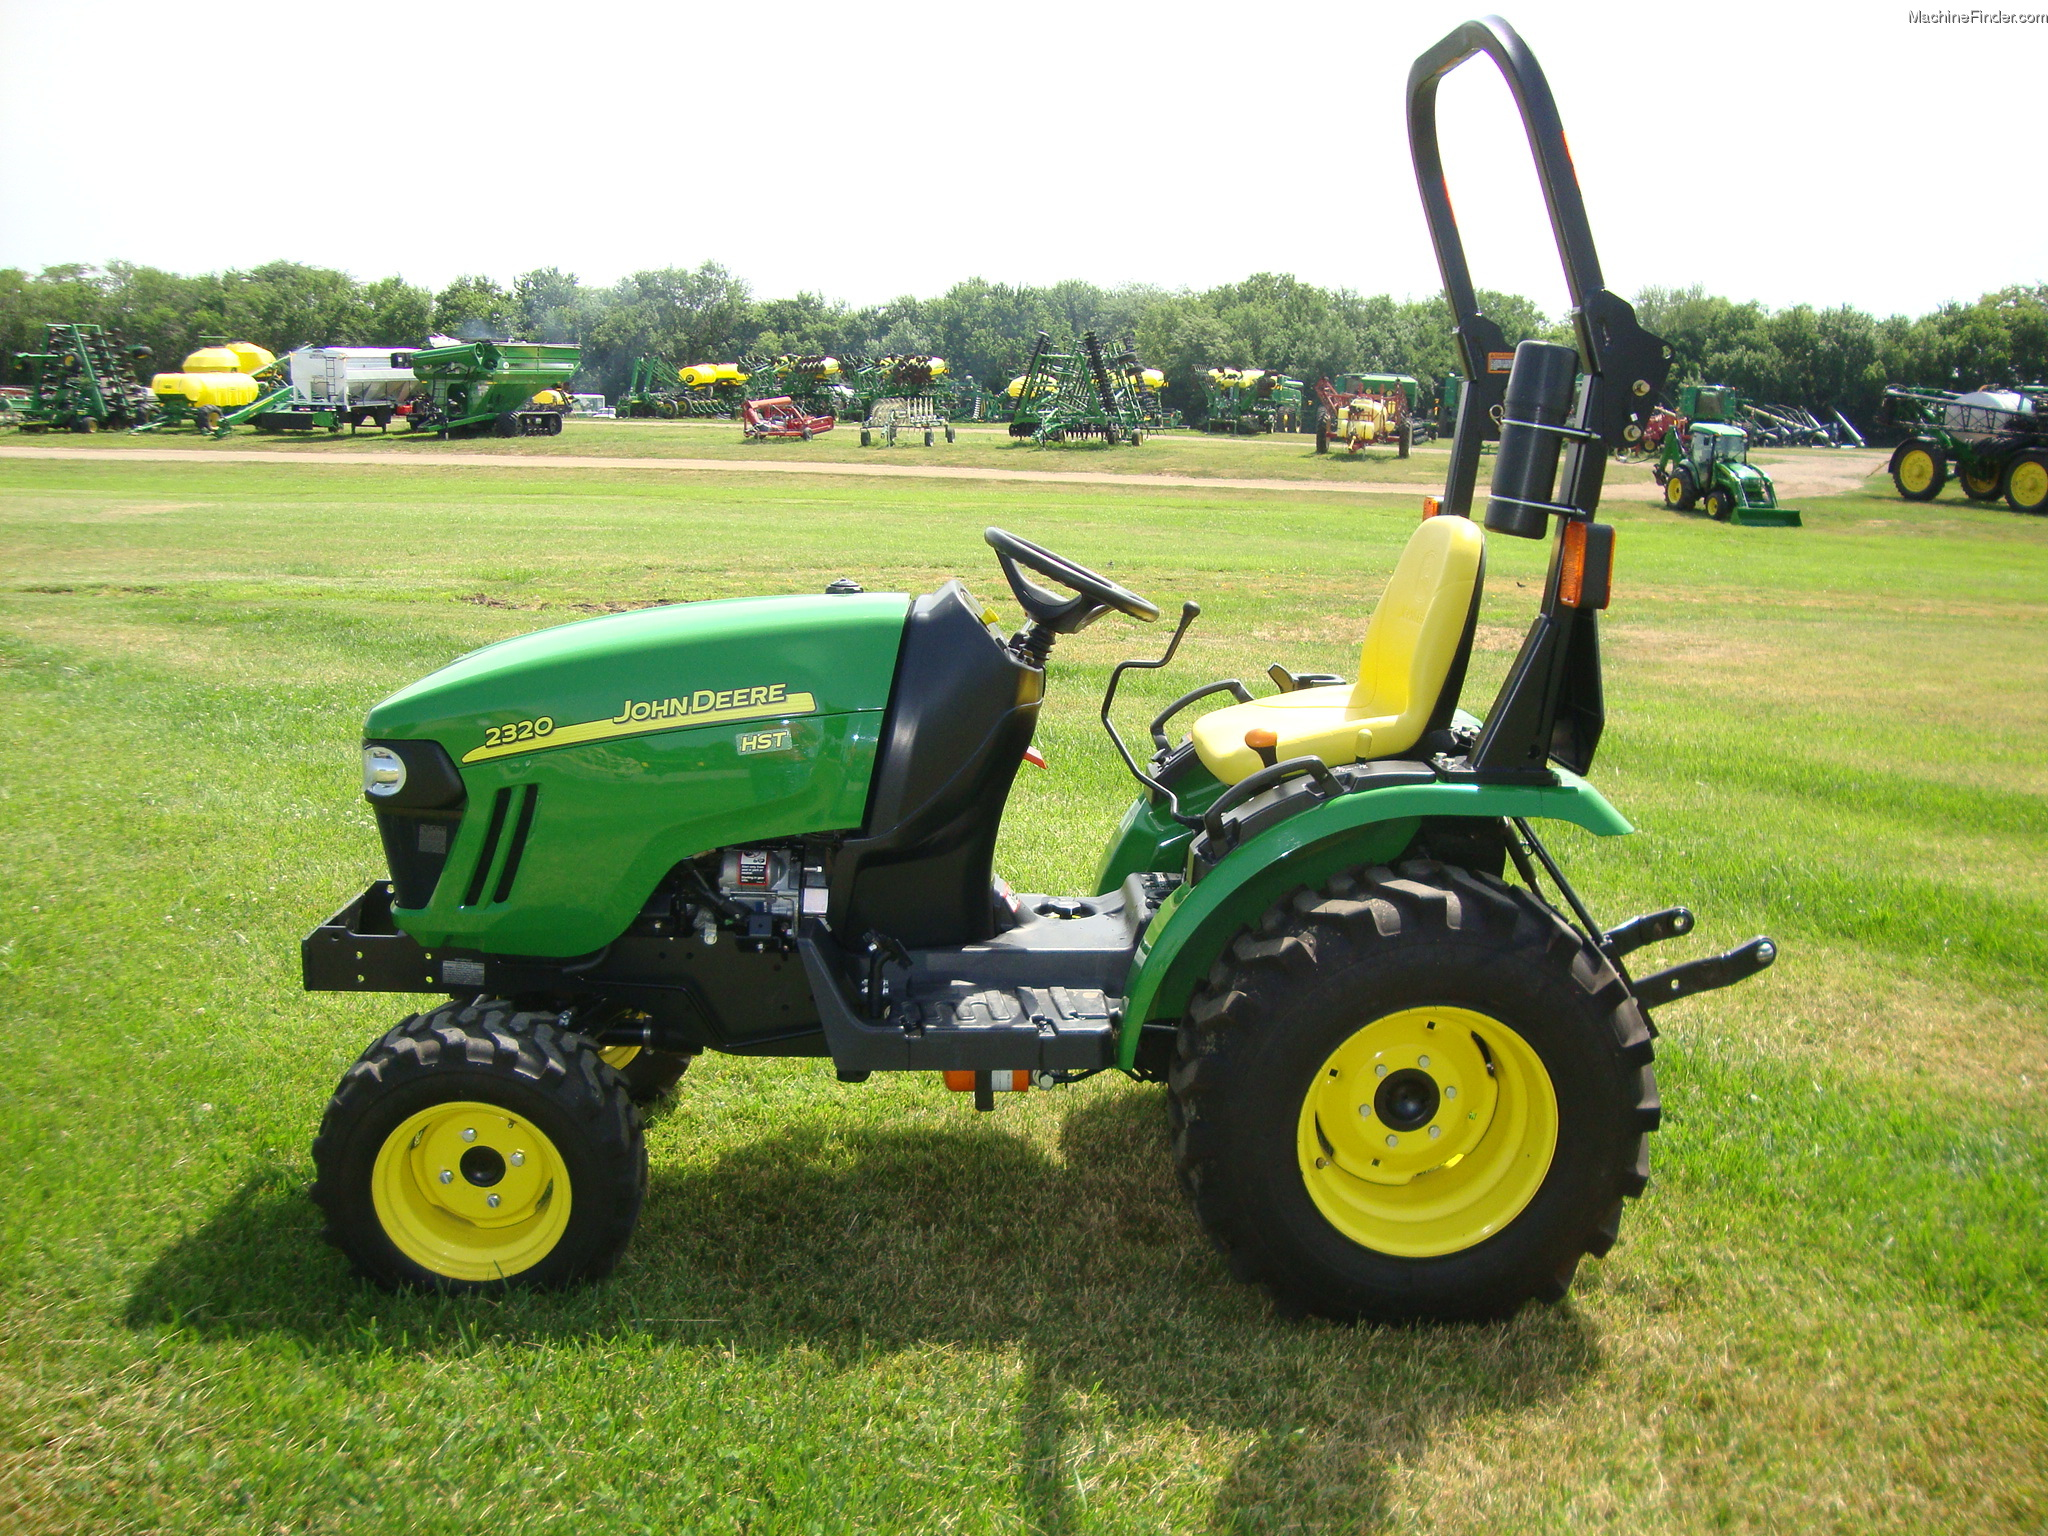 2010 John Deere 2320 Tractors - Compact (1-40hp.) - John ...